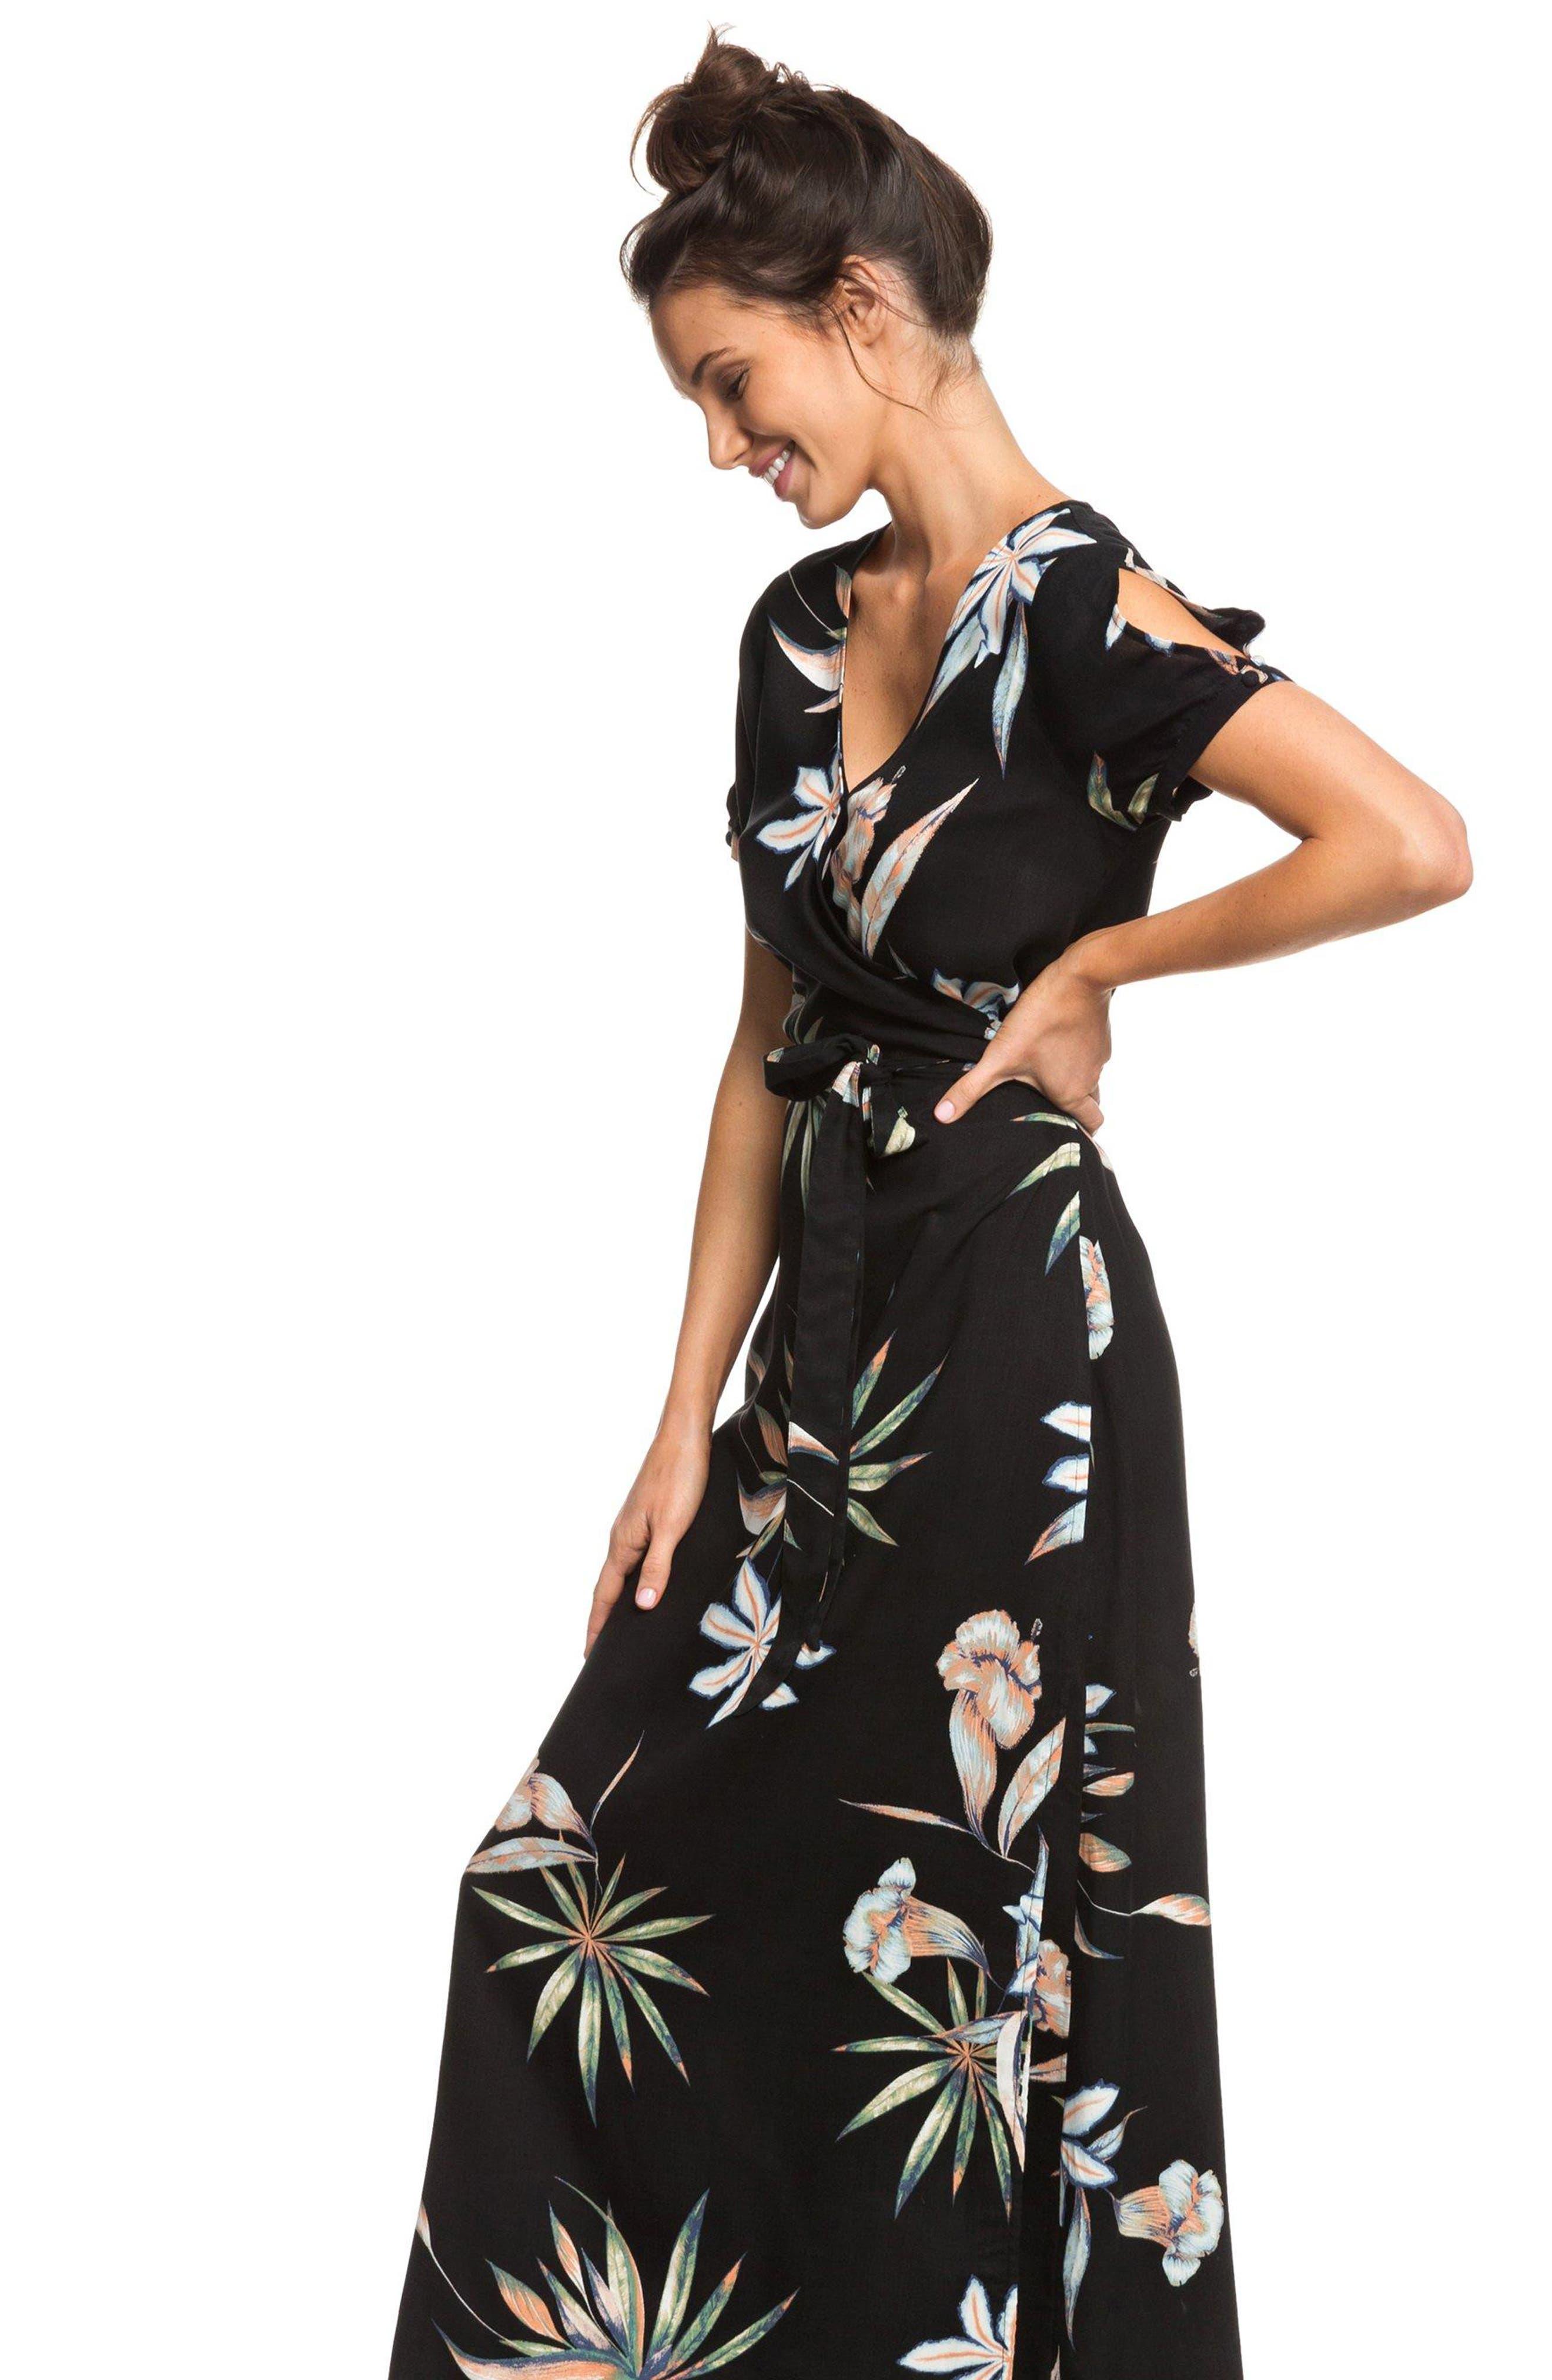 Lotus Heart Midi Dress,                             Alternate thumbnail 8, color,                             TRUE BLACK NIGHTLIGHTS